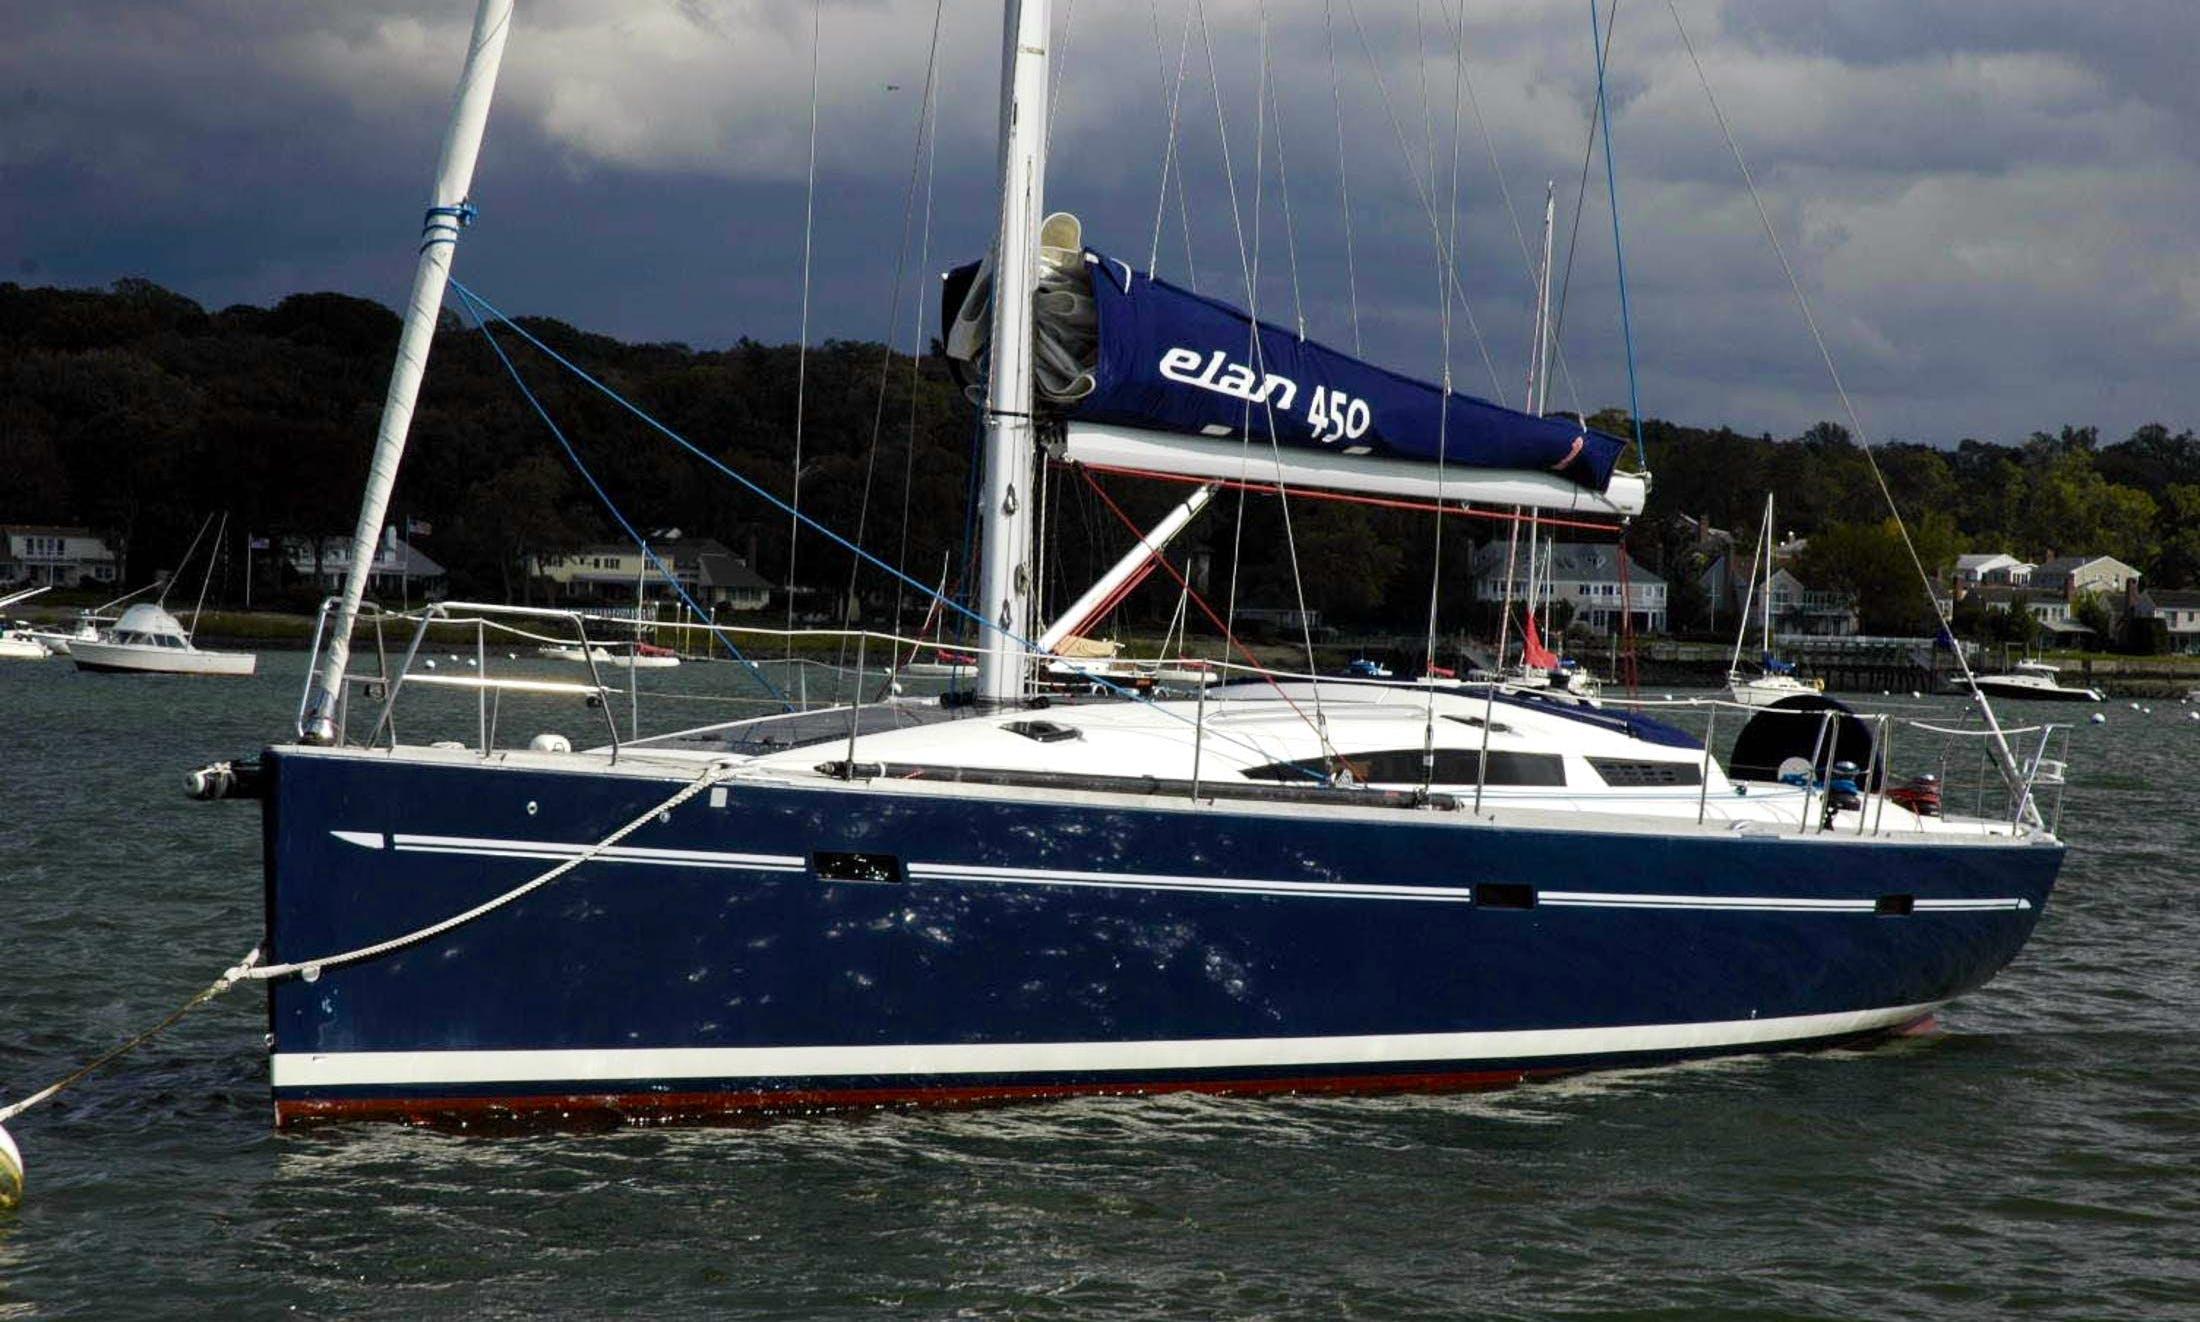 Hire an Elan 450 Sailing Yacht in Andalucía, Spain